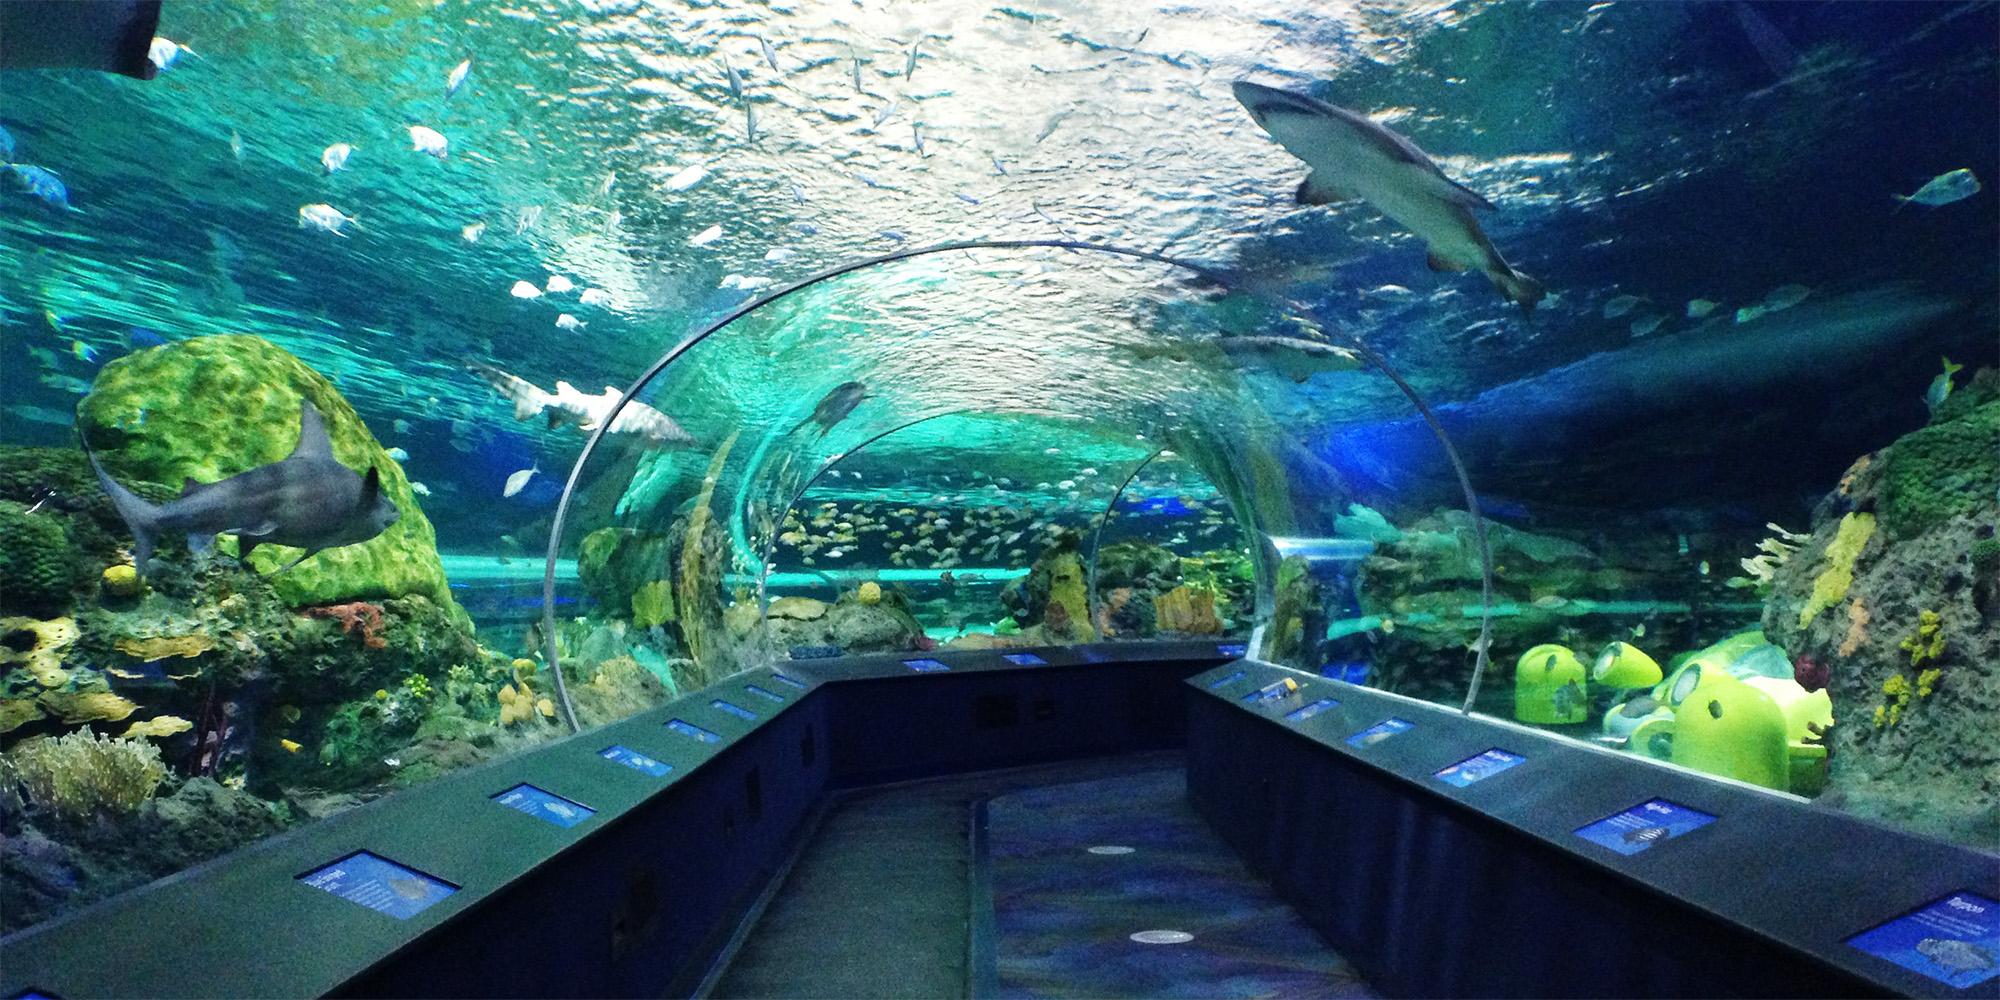 Ripleys aquarium tunnel with 360 views of sealife